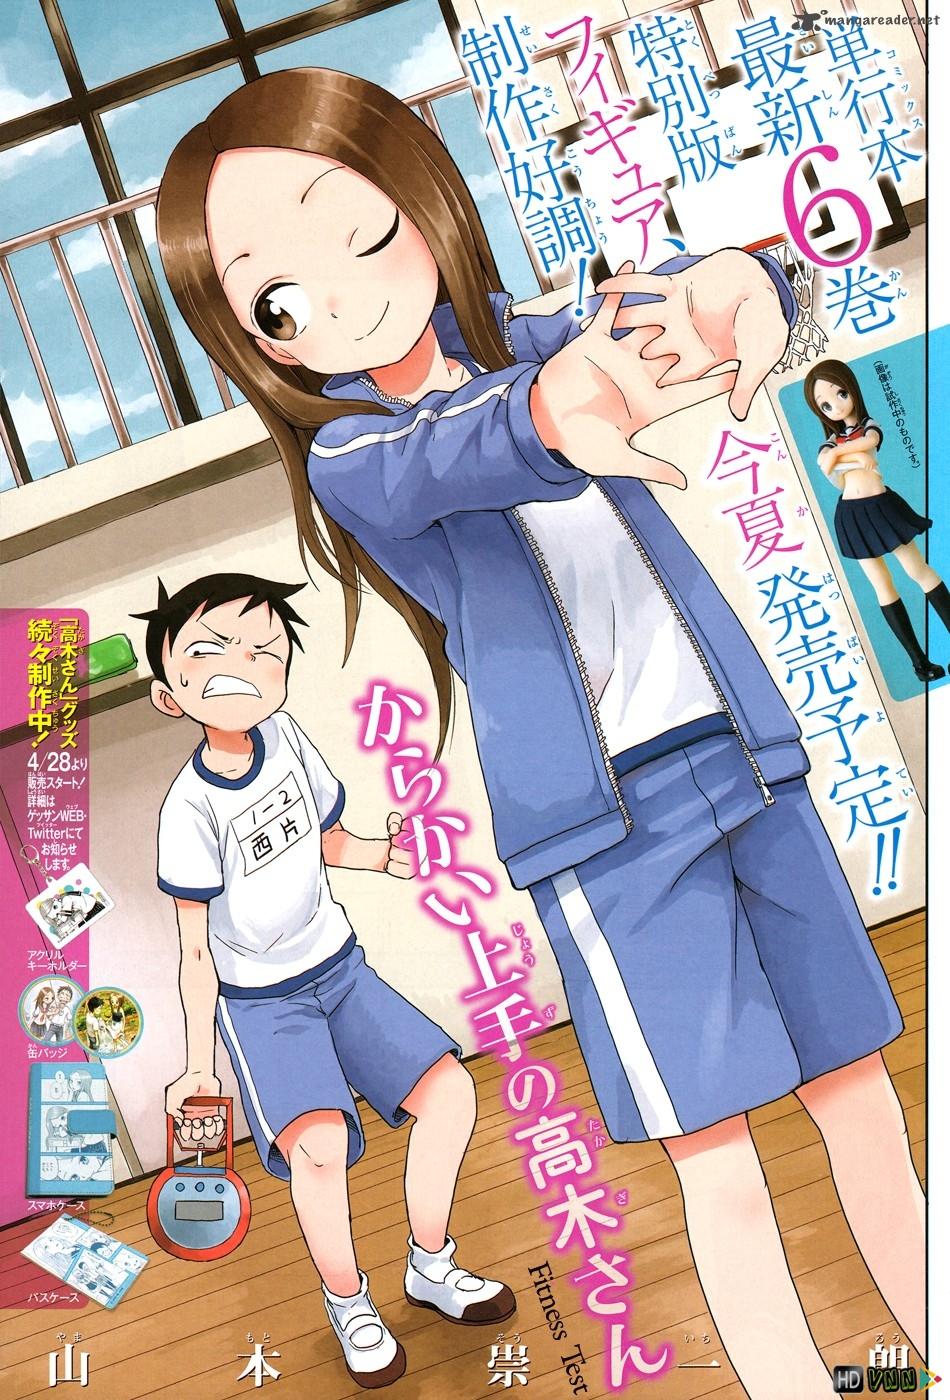 Karakai Jouzu no Takagi-san OVA